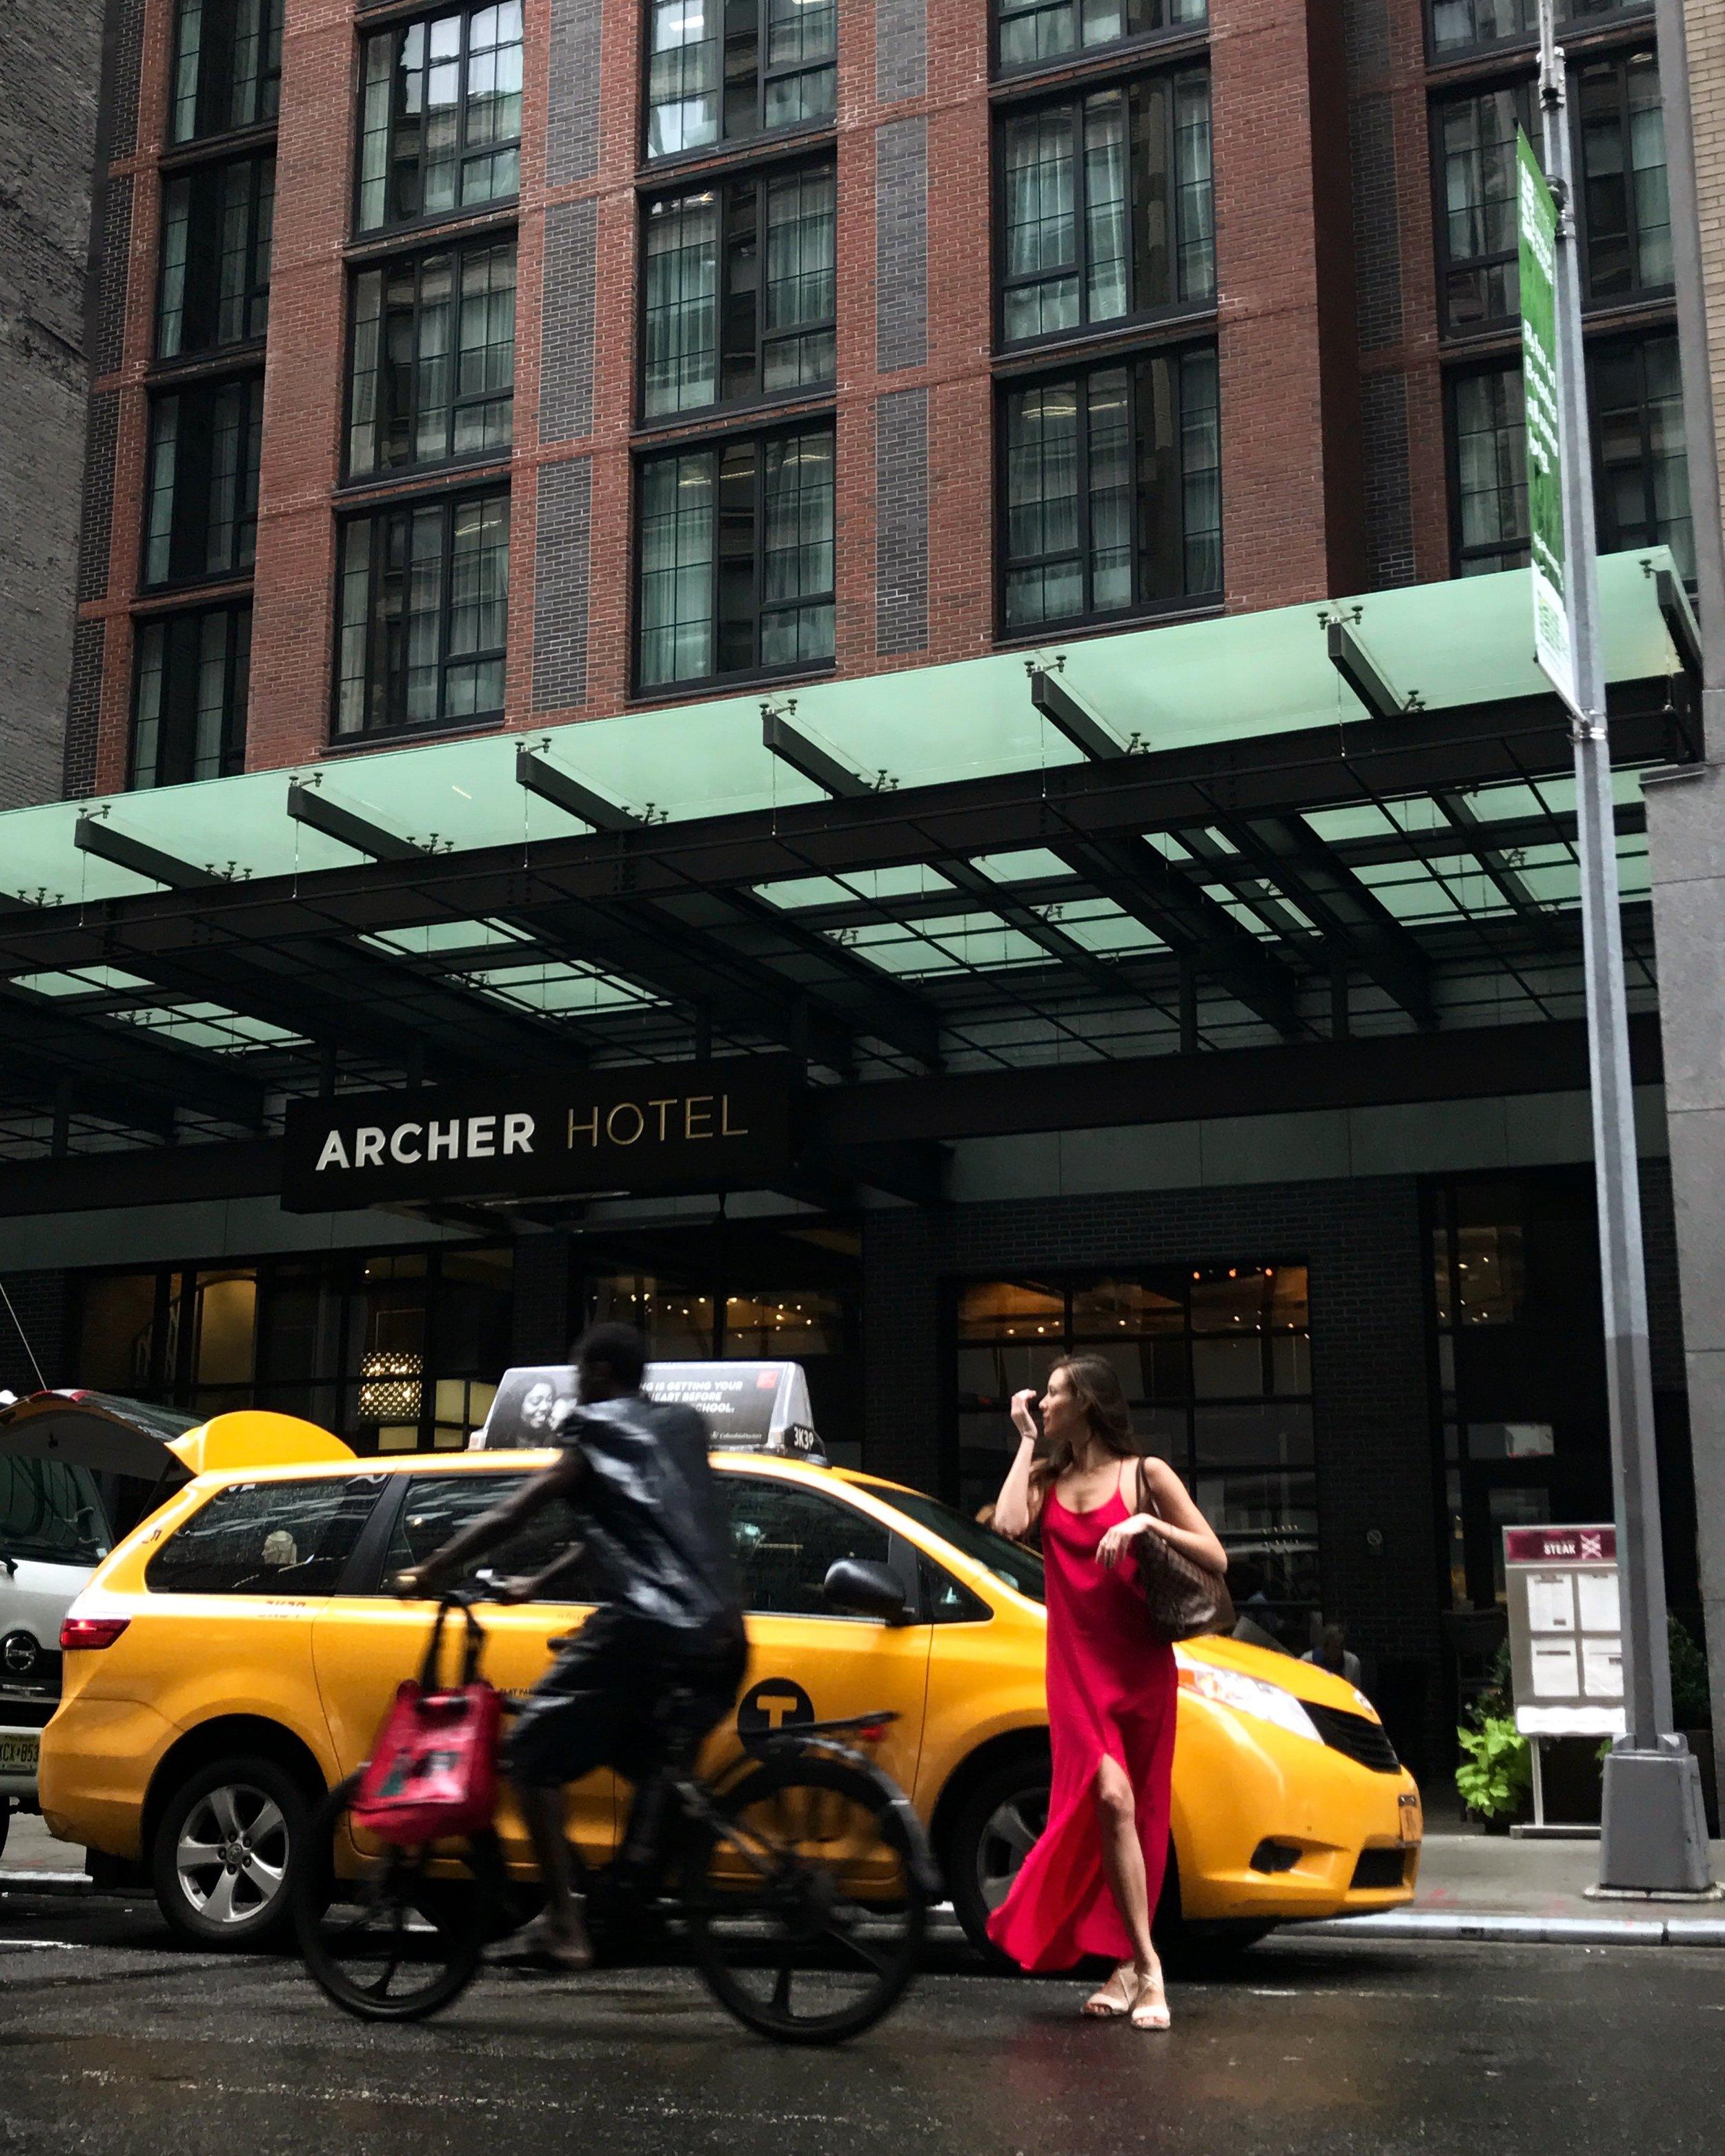 Archer Hotel, wearing Isle of White